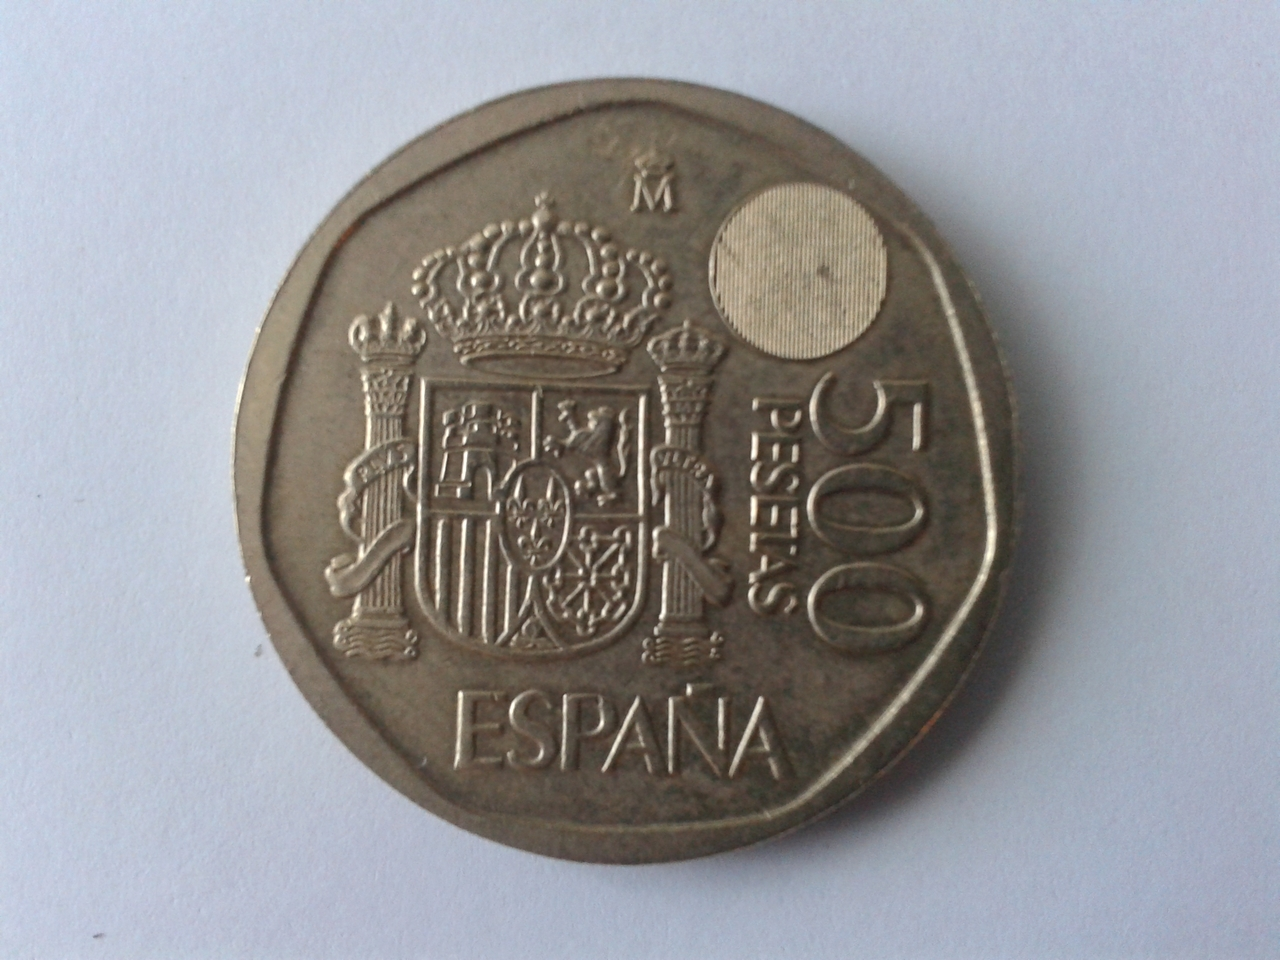 500 pesetas 2001 - Variante 20141101_153946